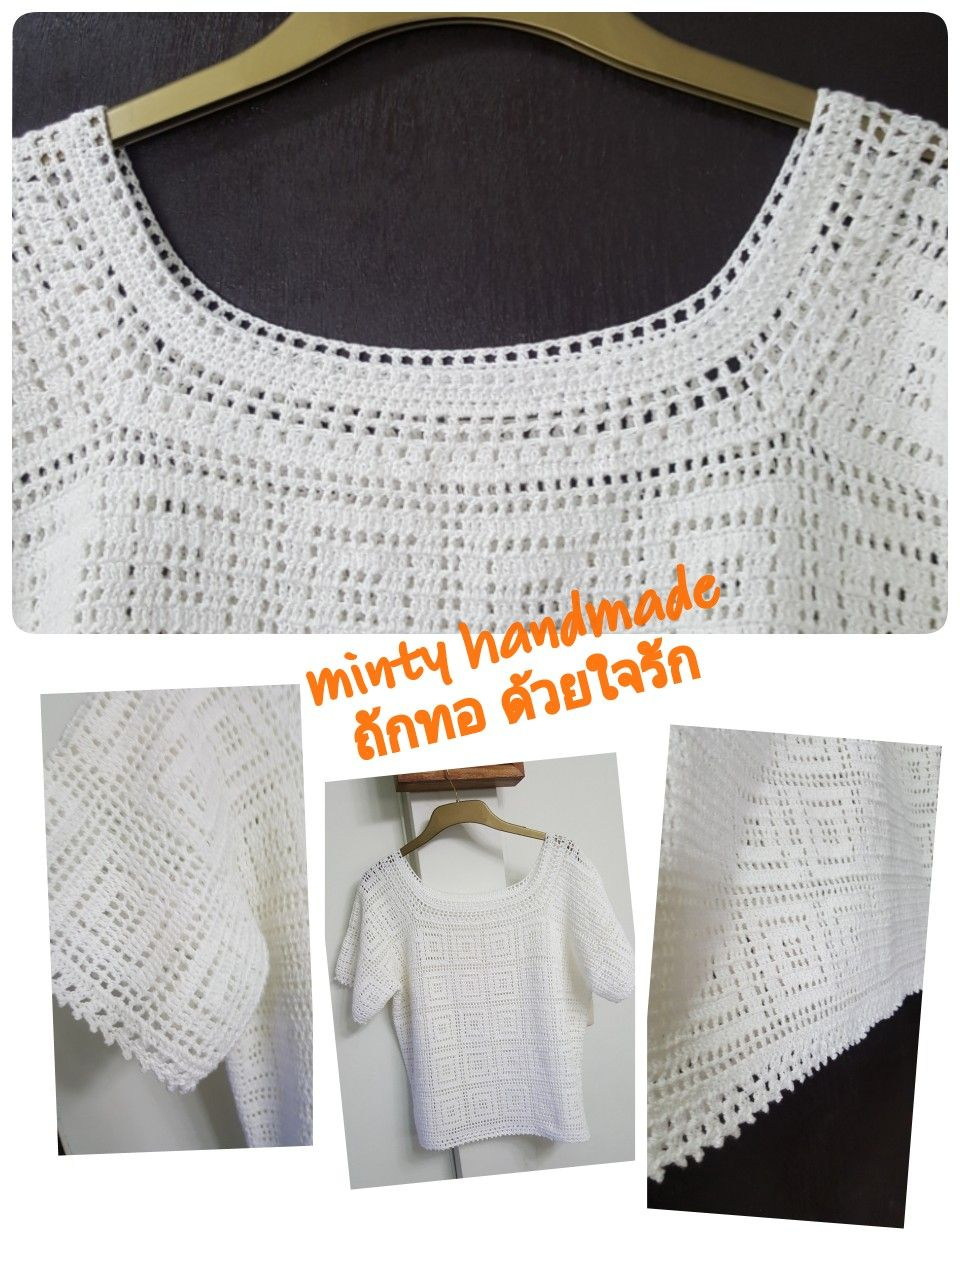 Pin de Ang en เสื้อถัก | Pinterest | Blusas tejidas y Blusas